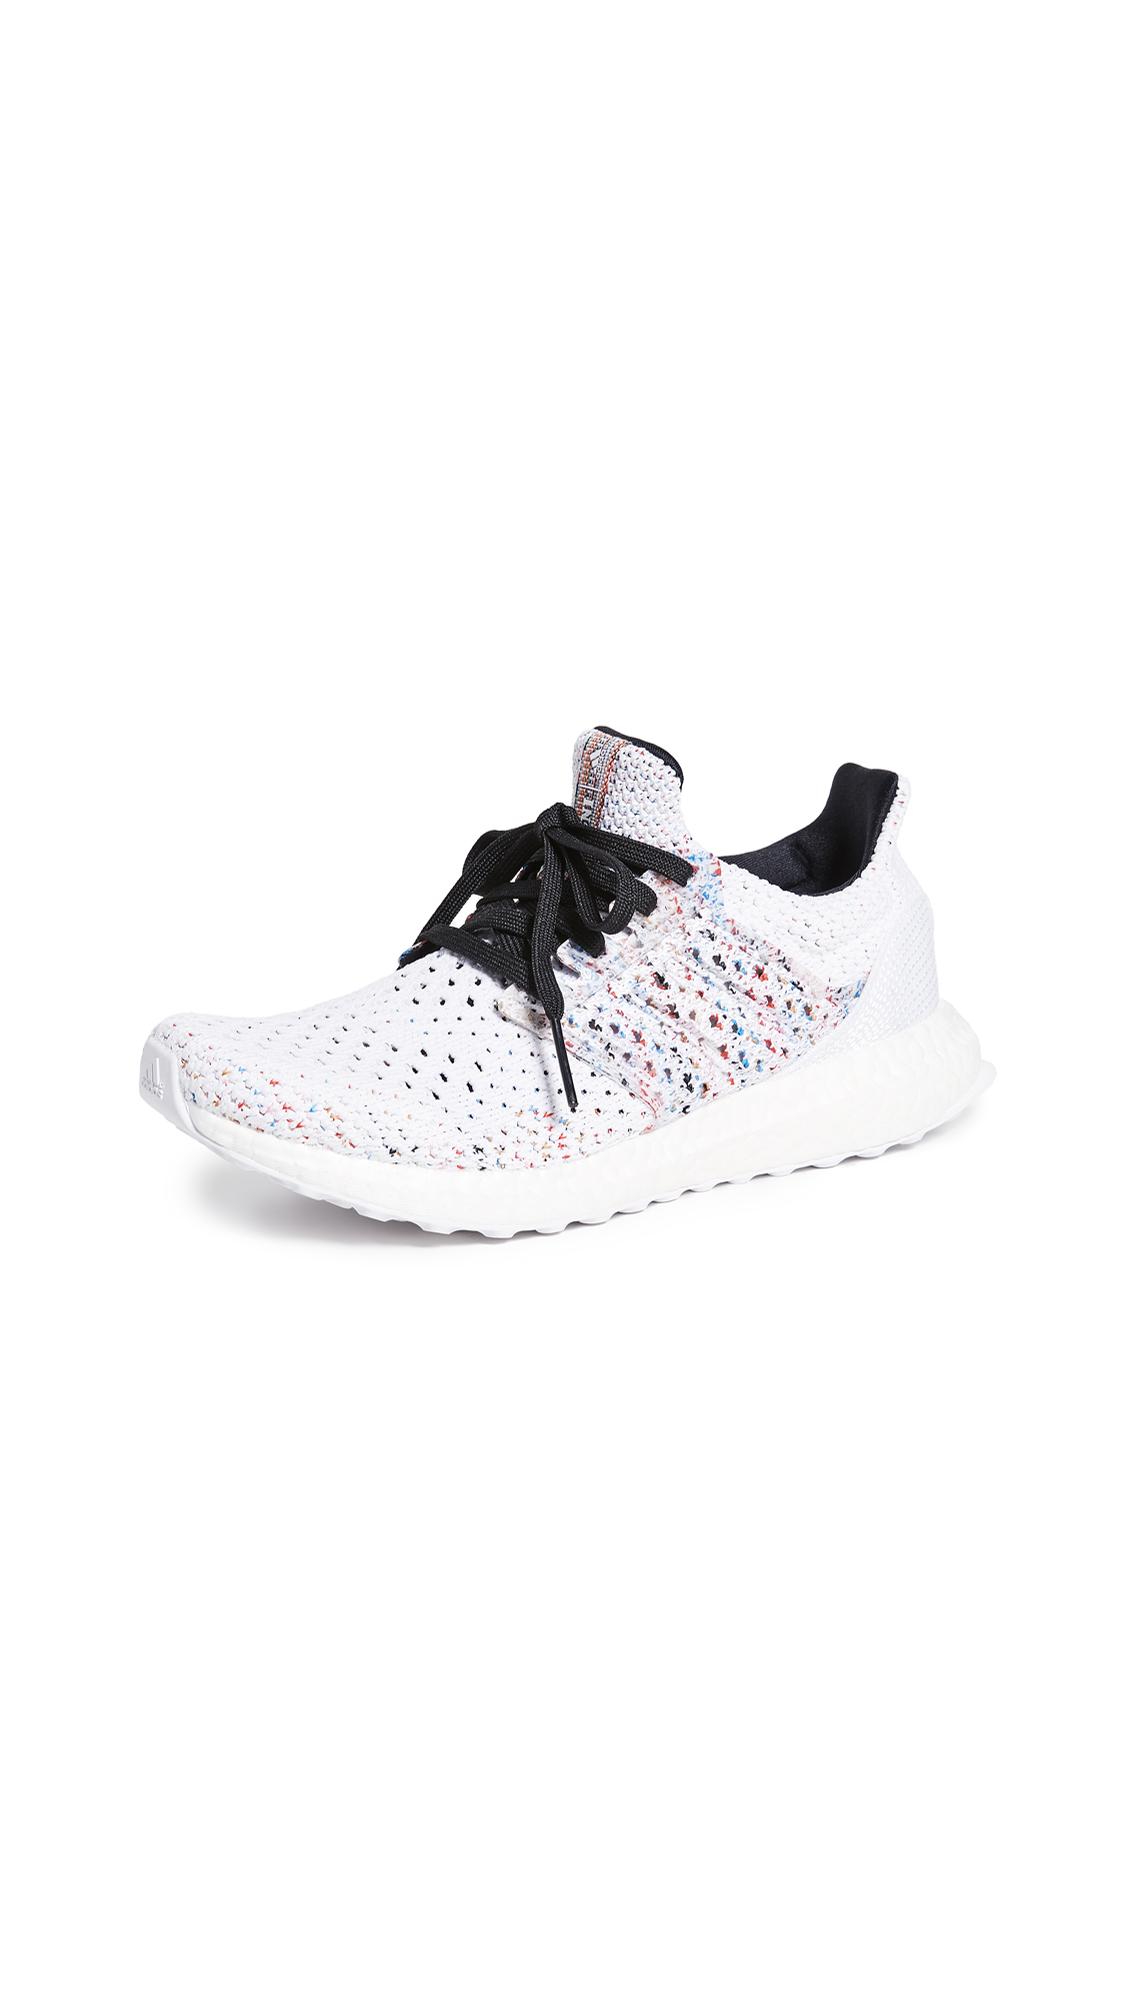 adidas Ultraboost CLIMA x MISSONI Sneakers - White/White/Activere